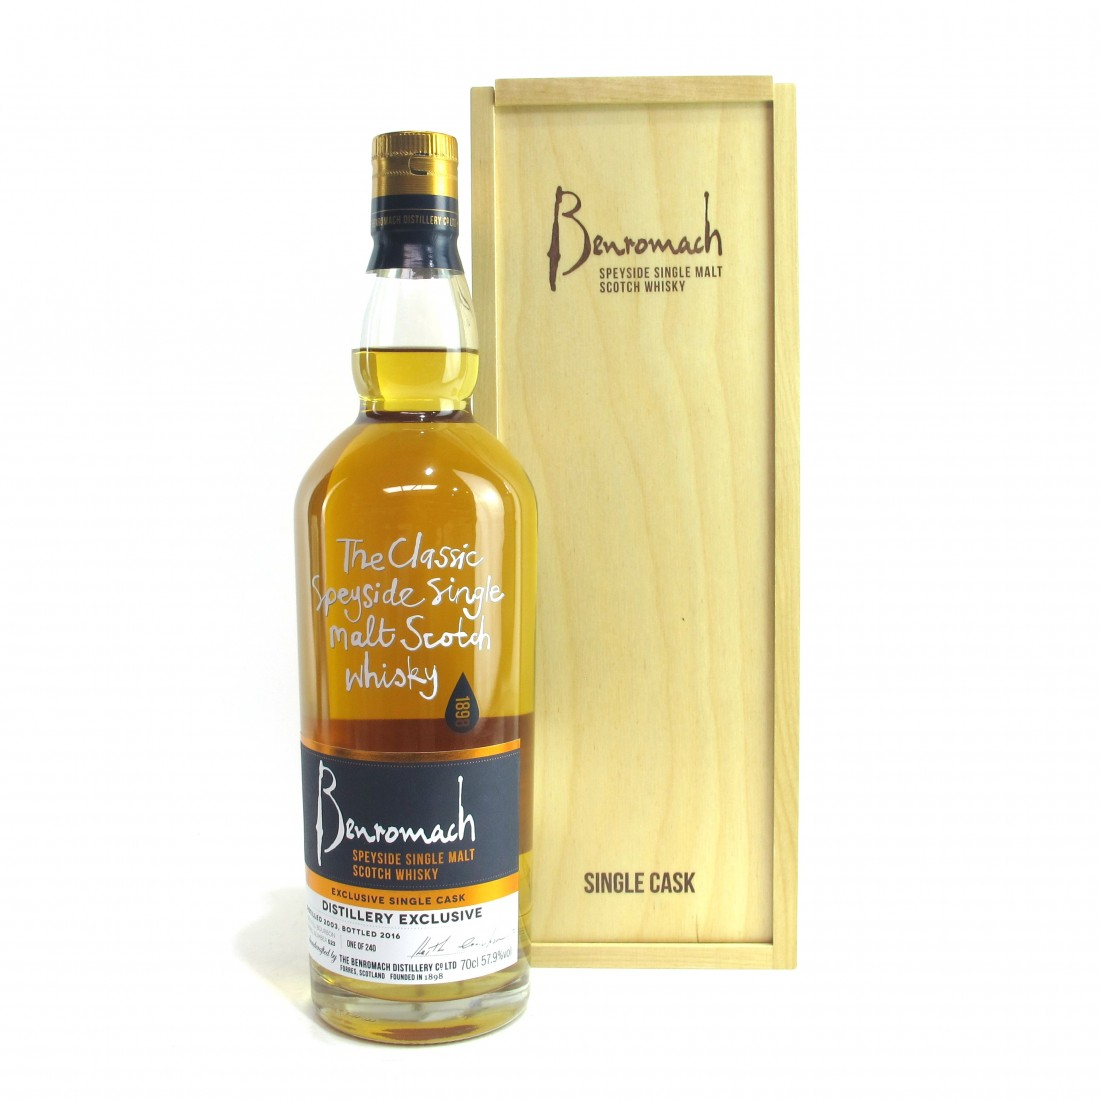 Benromach 2003 Single Cask #523 / Distillery Exclusive